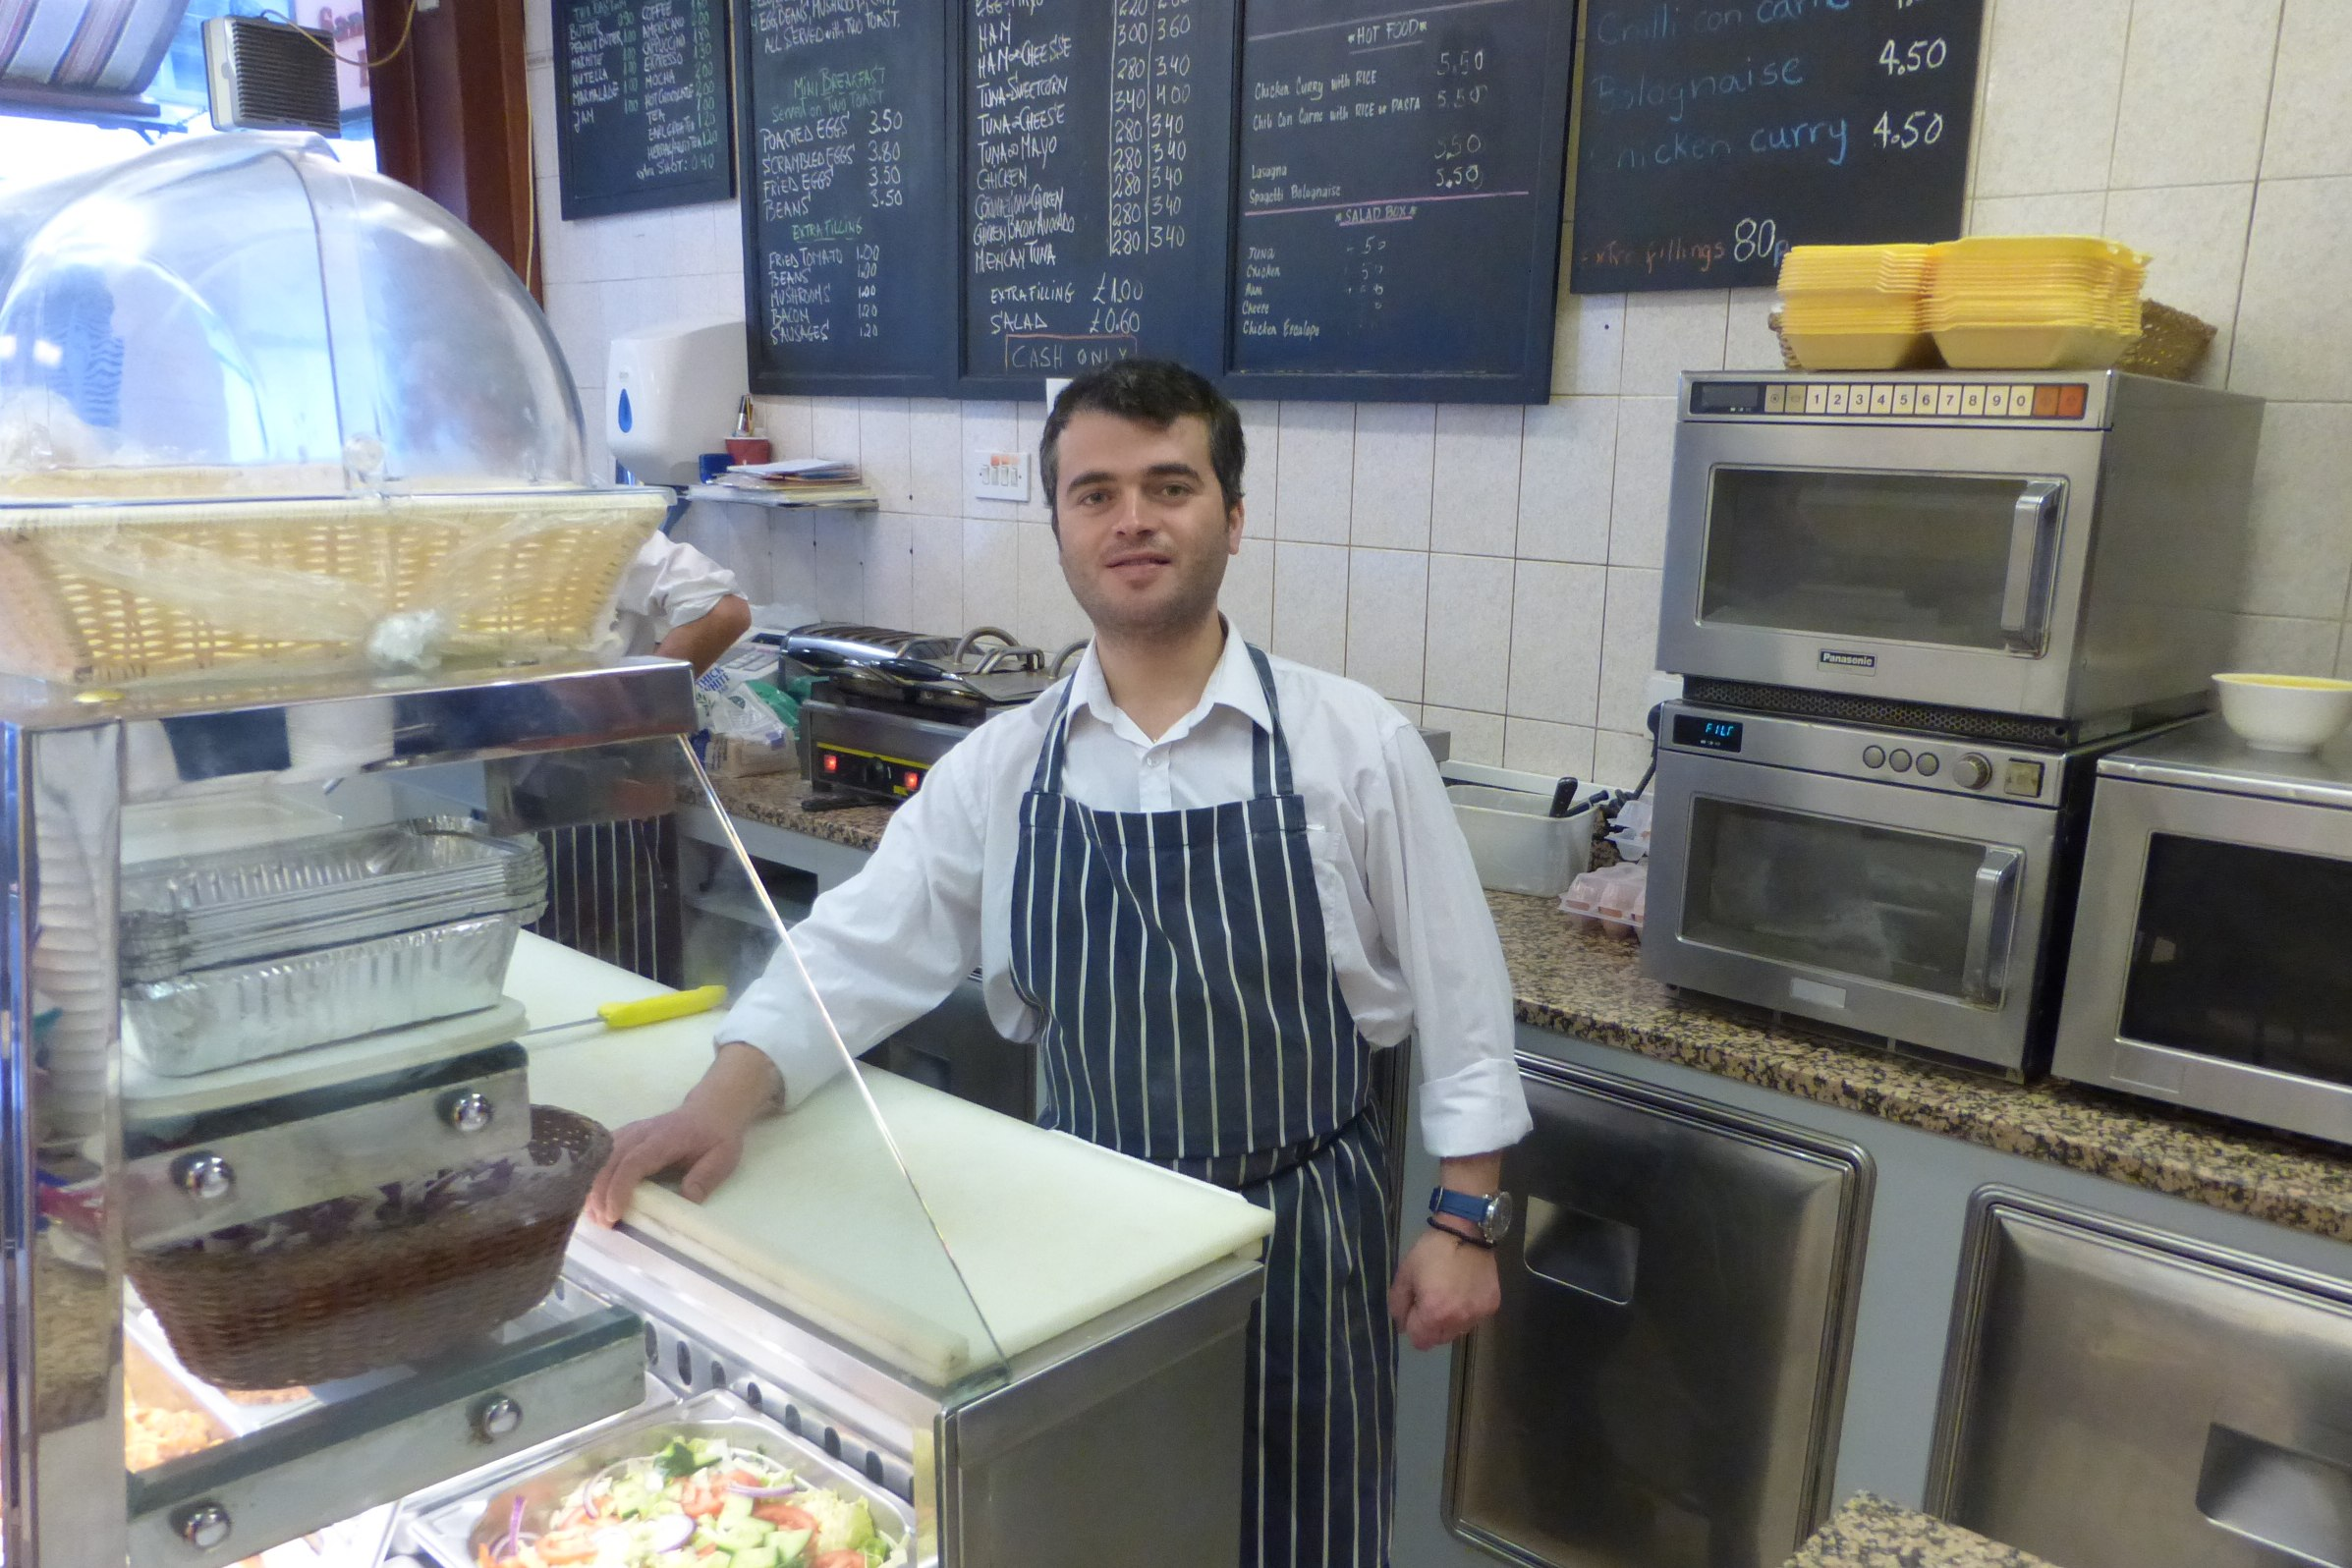 Nuno S Cafe Avalon Reviews